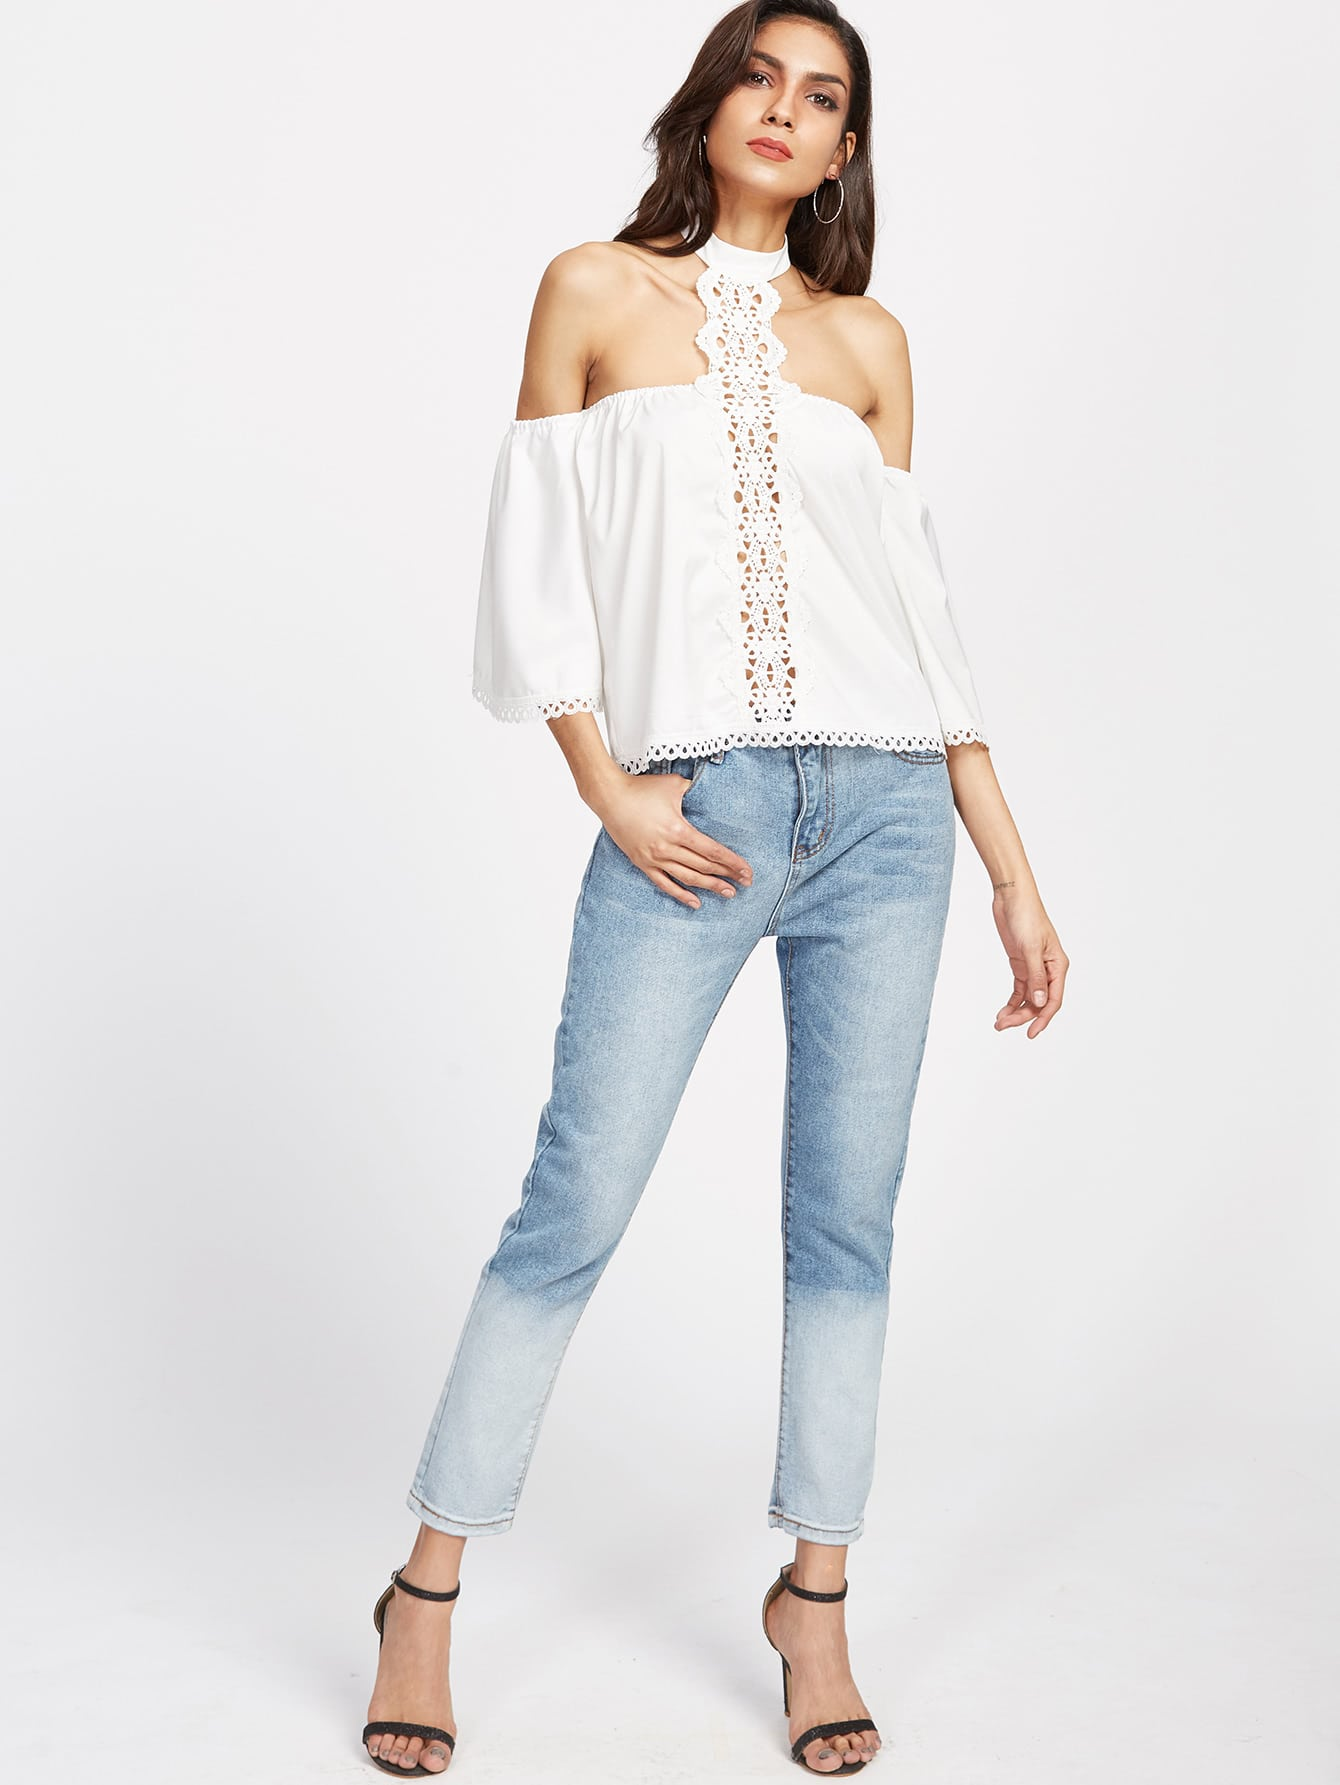 blouse170316103_2